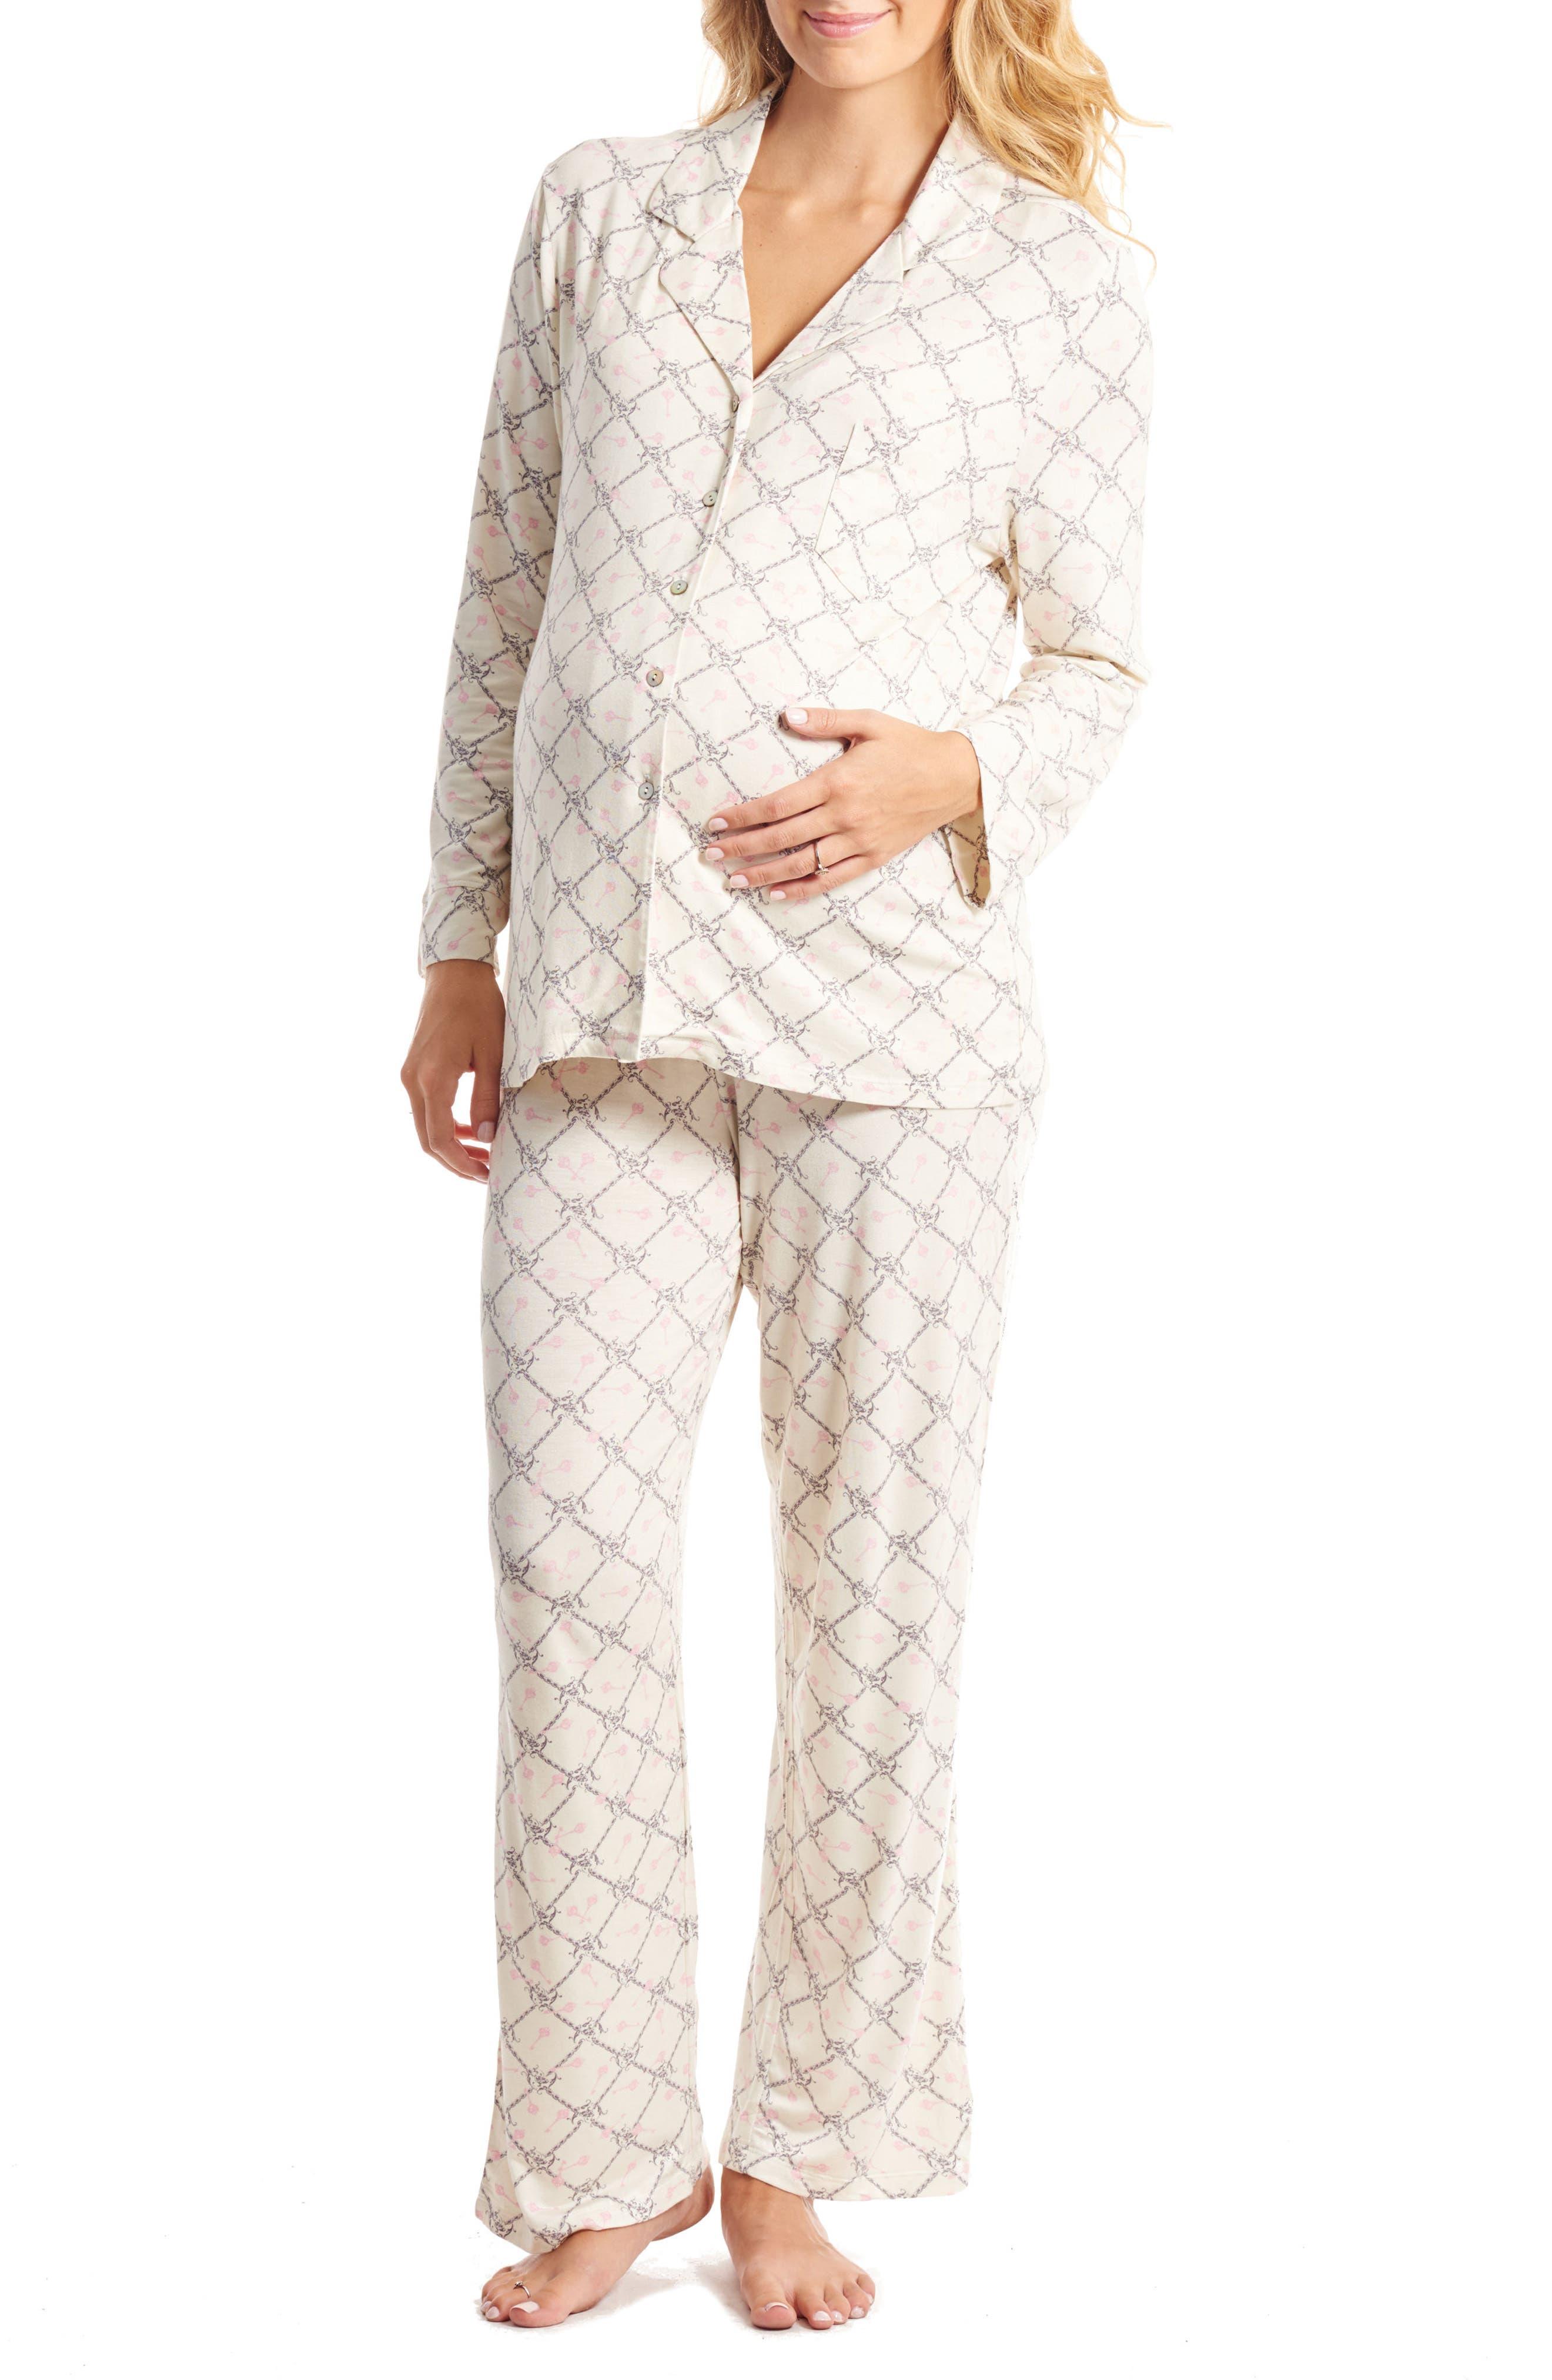 Helena Maternity/Nursing Pajamas,                             Main thumbnail 1, color,                             006